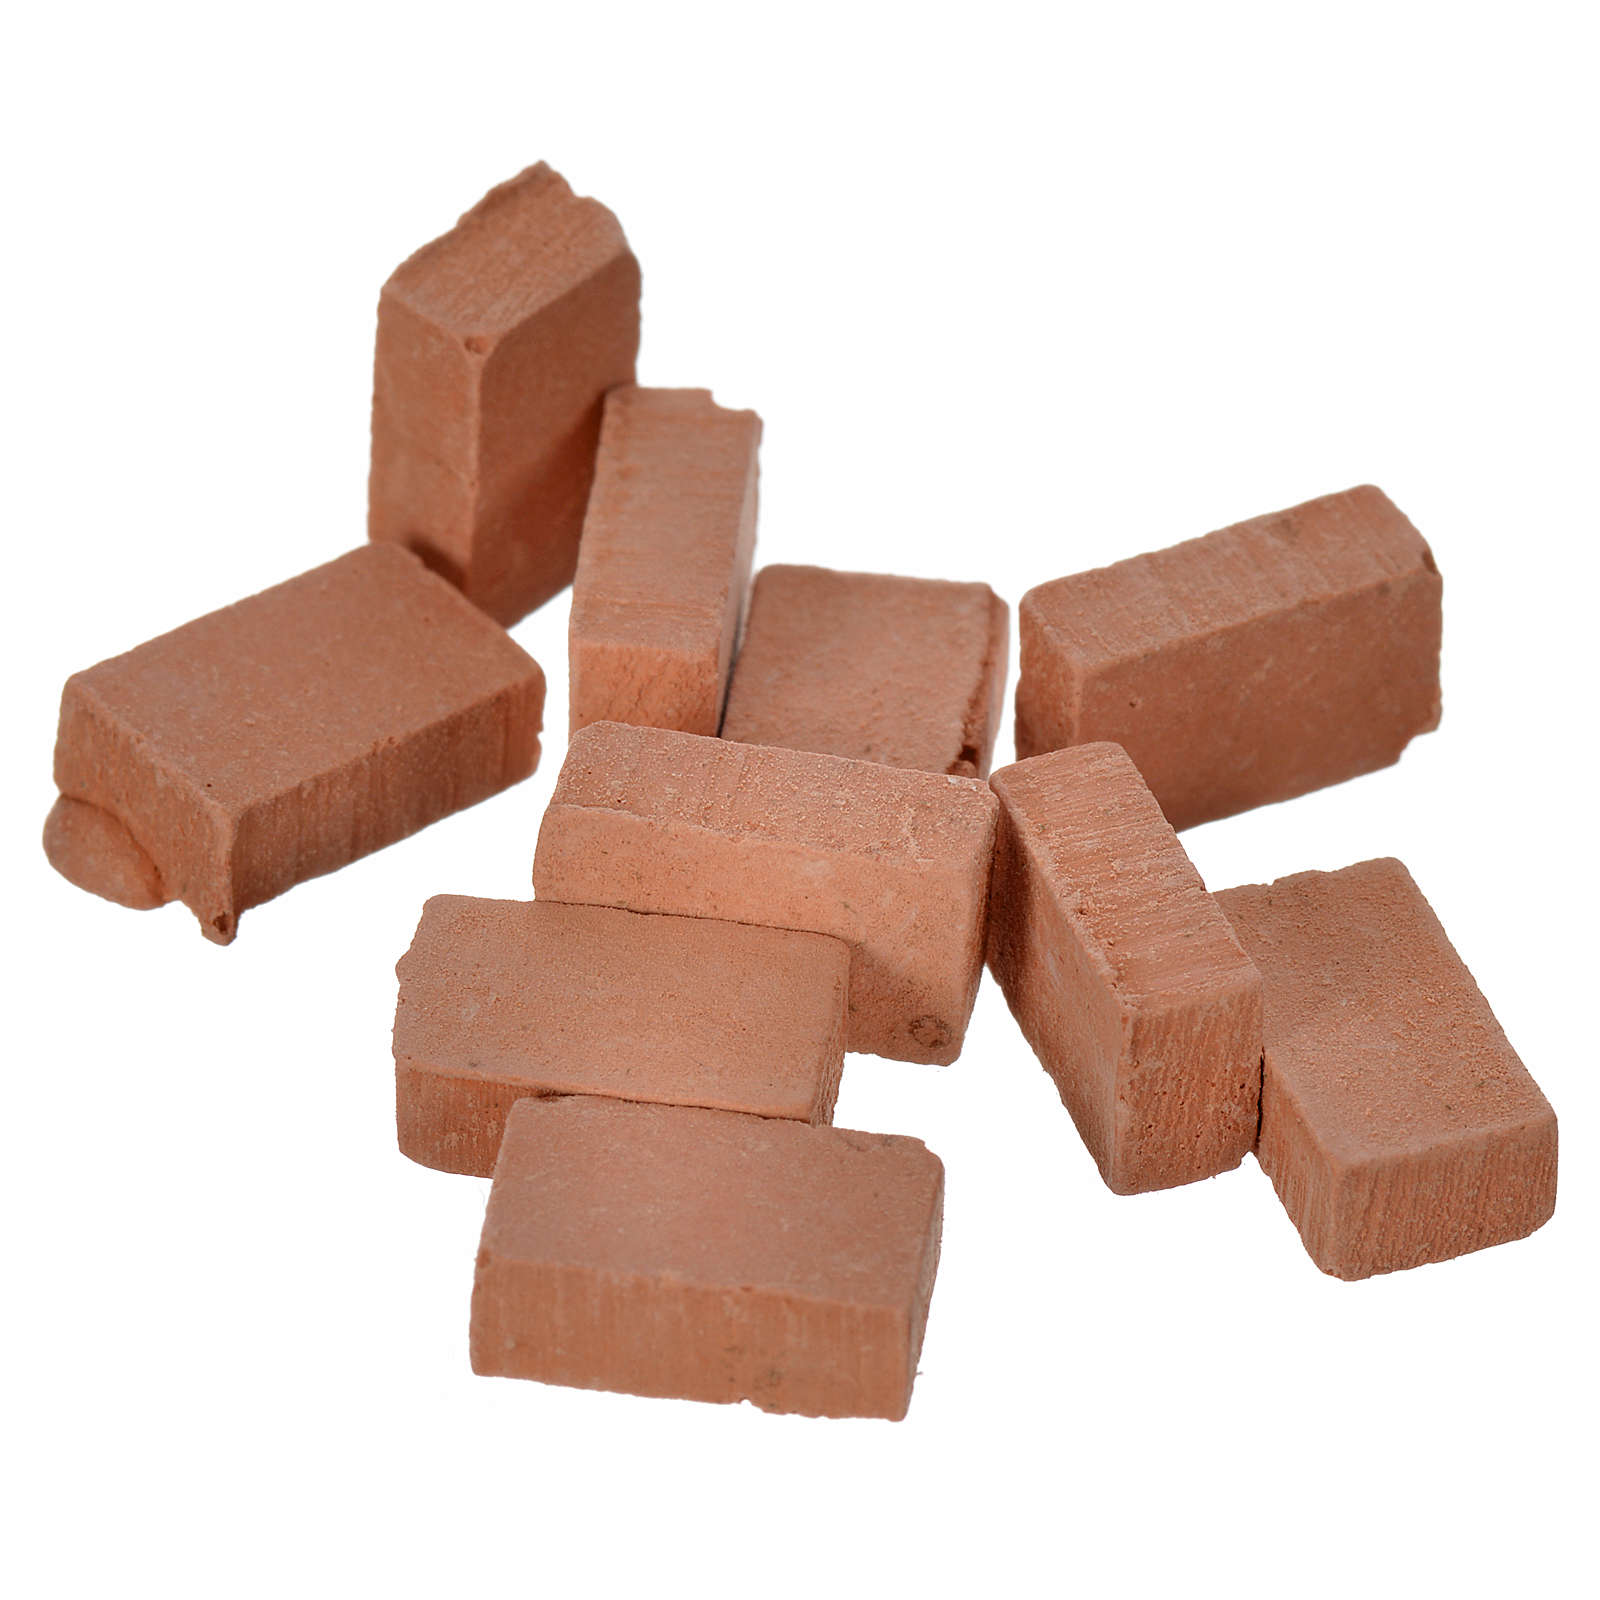 Nativity accessory, resin bricks 10x7mm, set of 100pcs 4